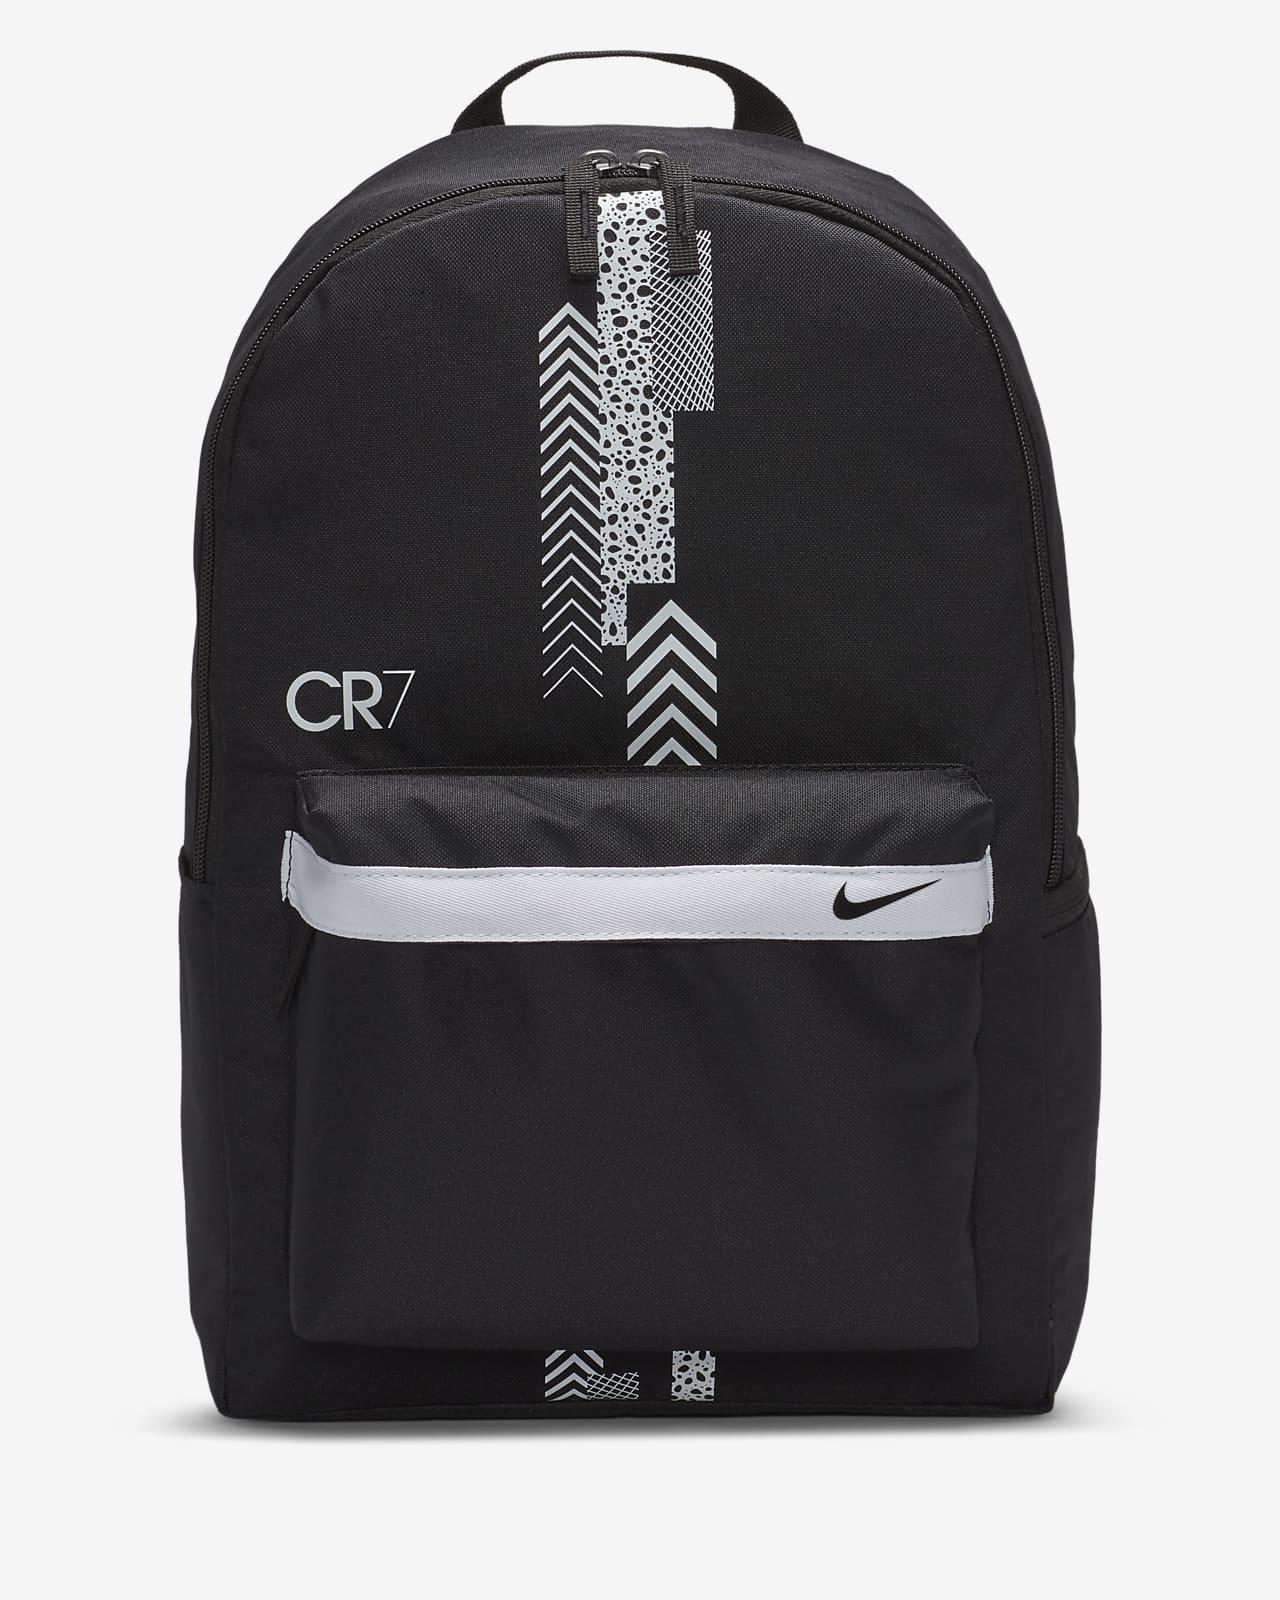 CR7 キッズ サッカーバックパック